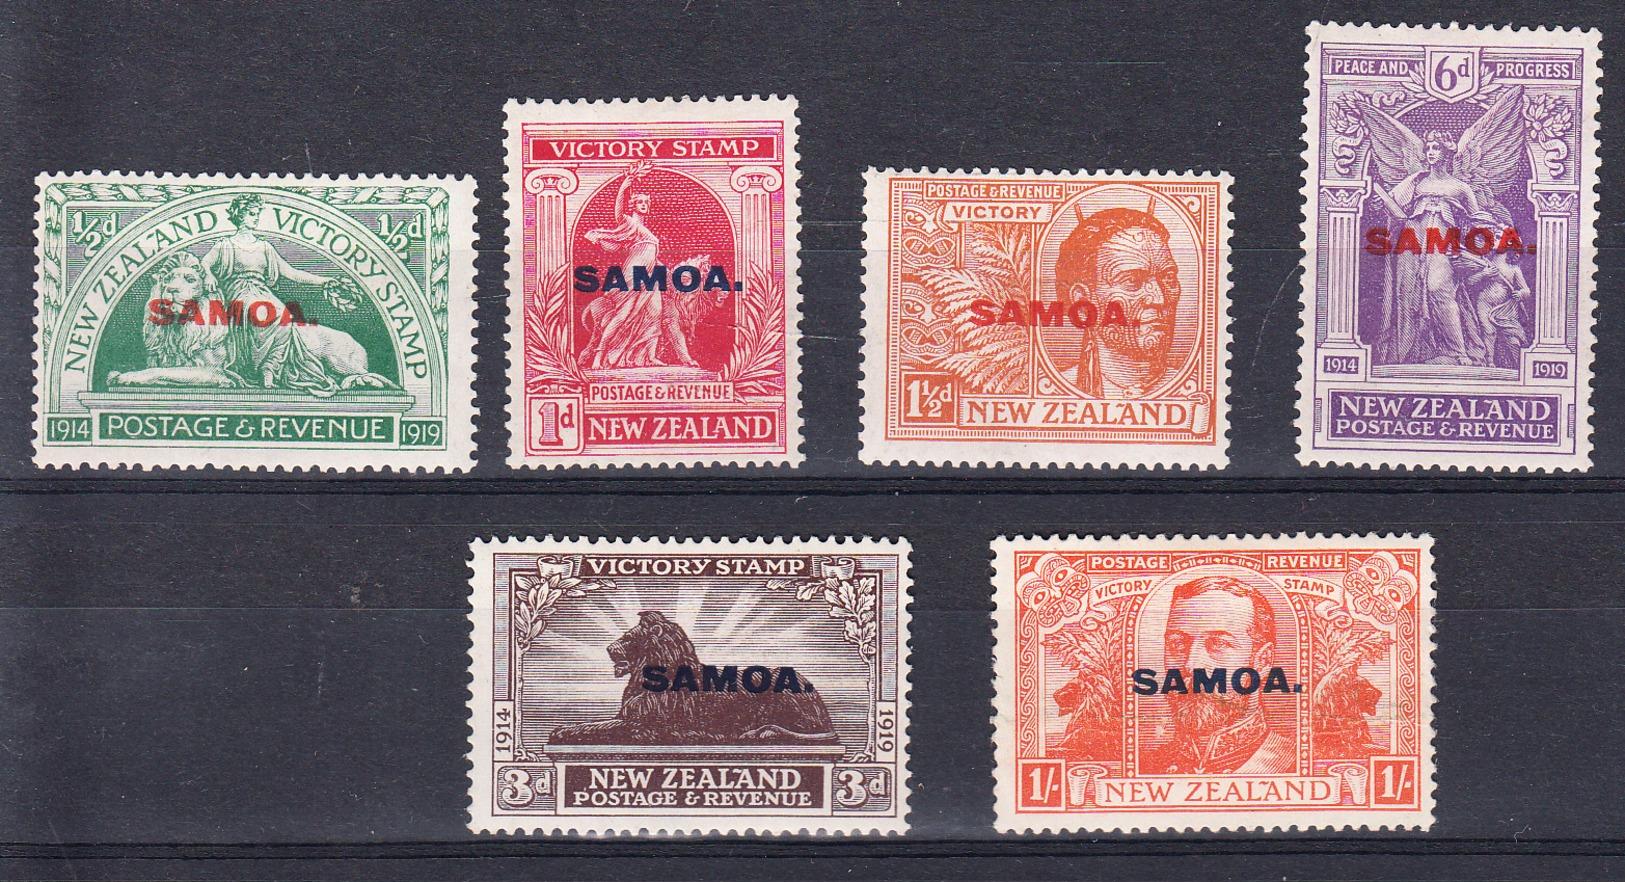 SAMOA 1920.COMPLETE SET  VICTORY STAMP  NEW ZEALAND OVERPRINTS.SCOTT 136/141  MLH. SES869 - Samoa